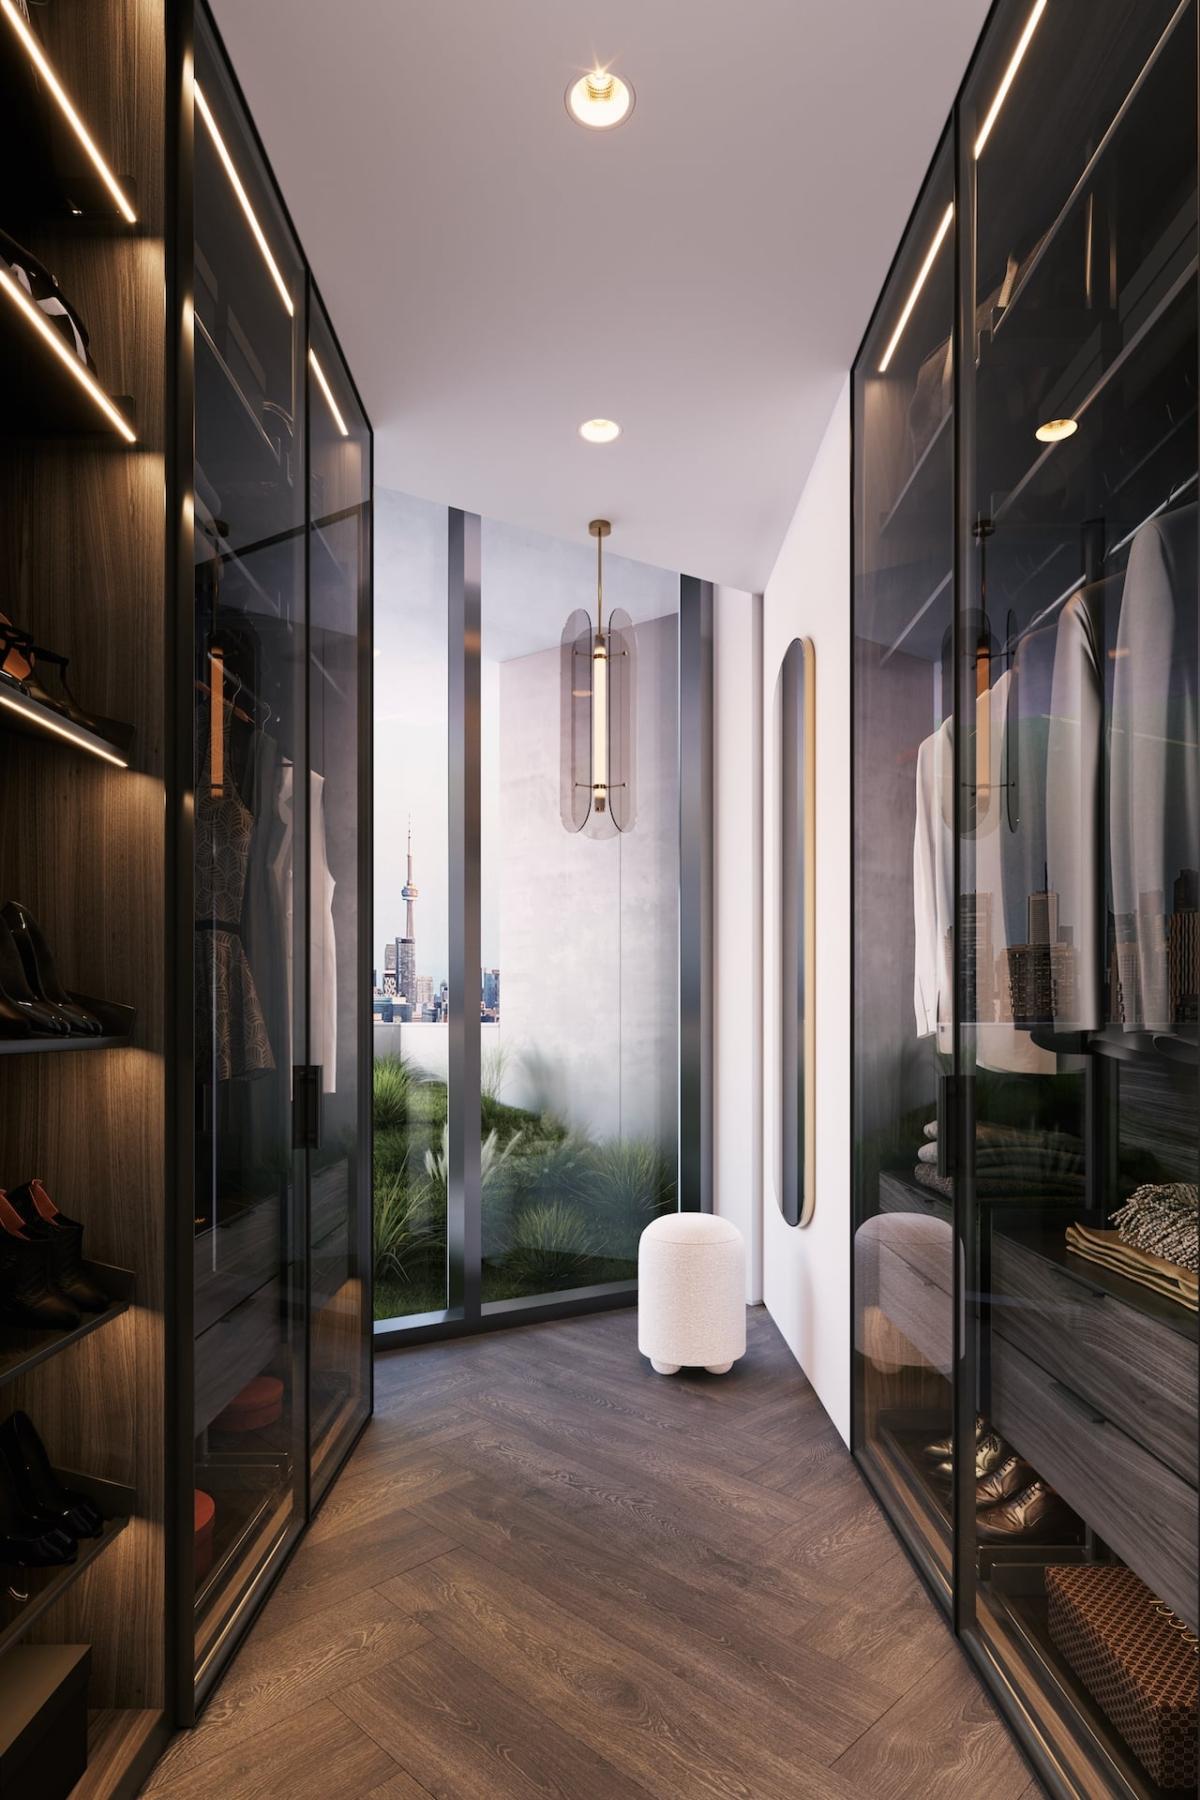 Rendering of One Delisle Penthouse interior walk-in closet